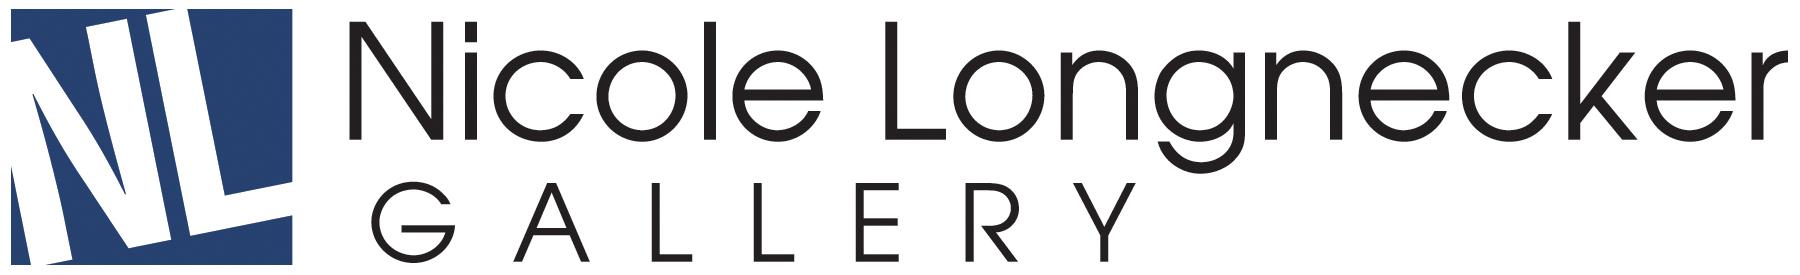 Nicole Longnecker Gallery